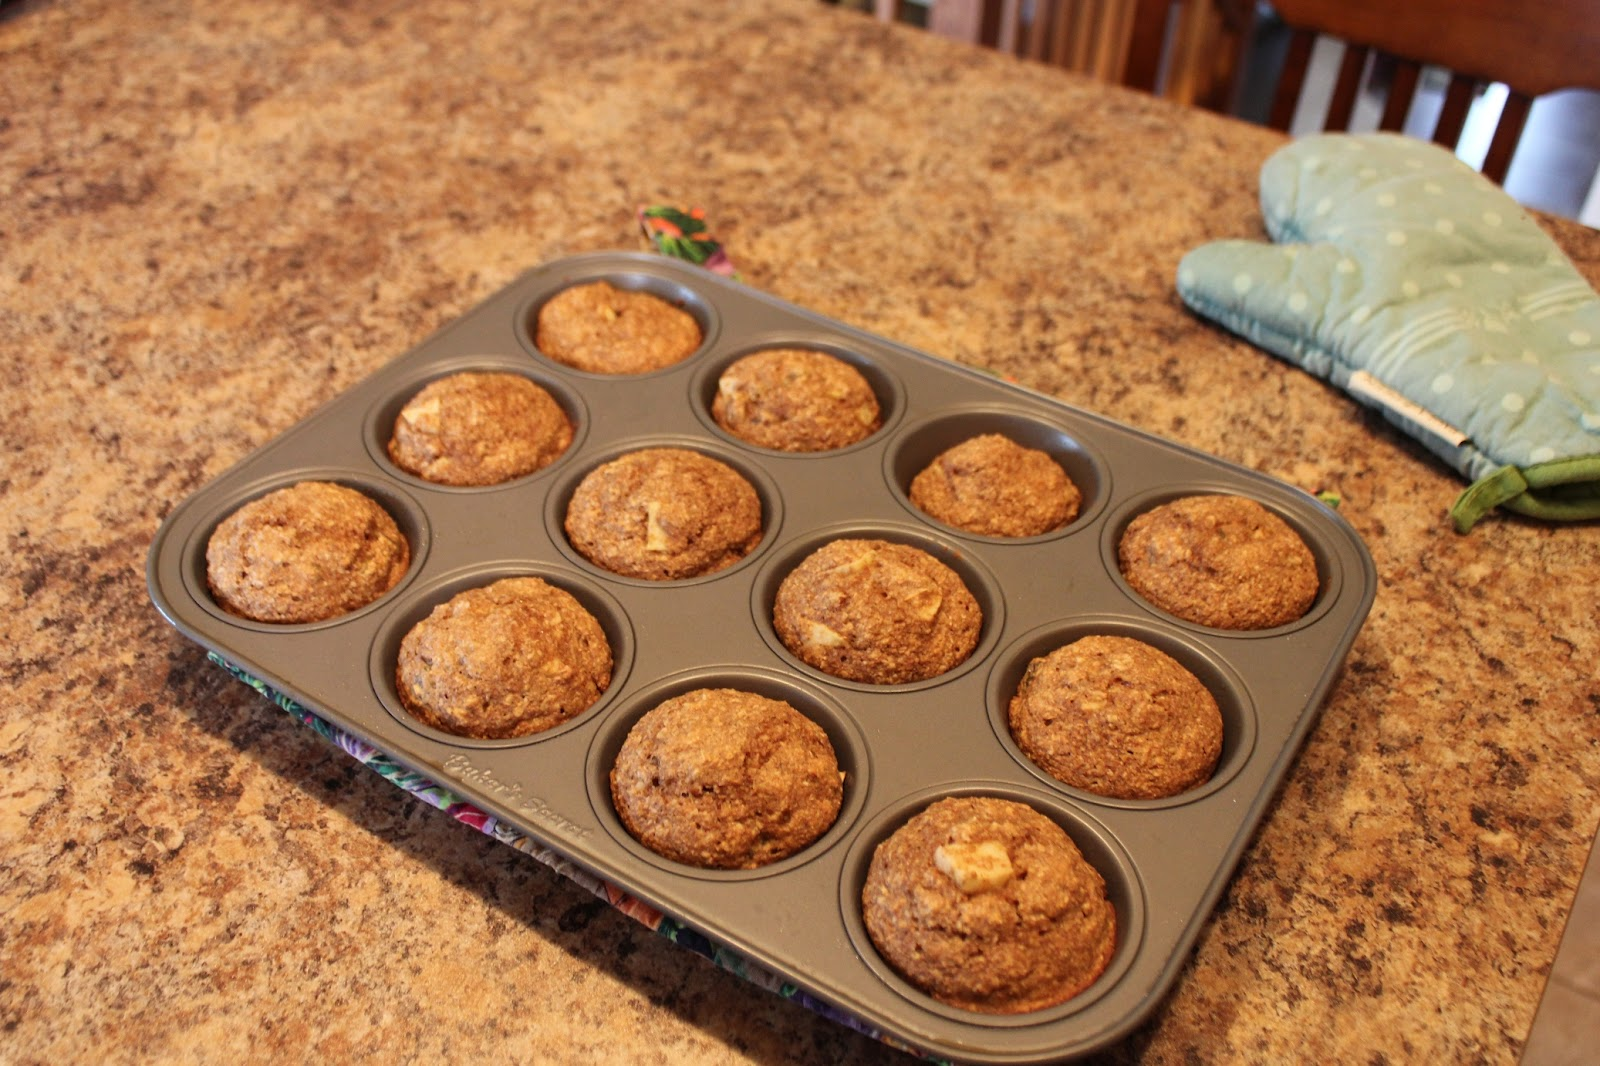 Granny Smith Apple Bran Muffins